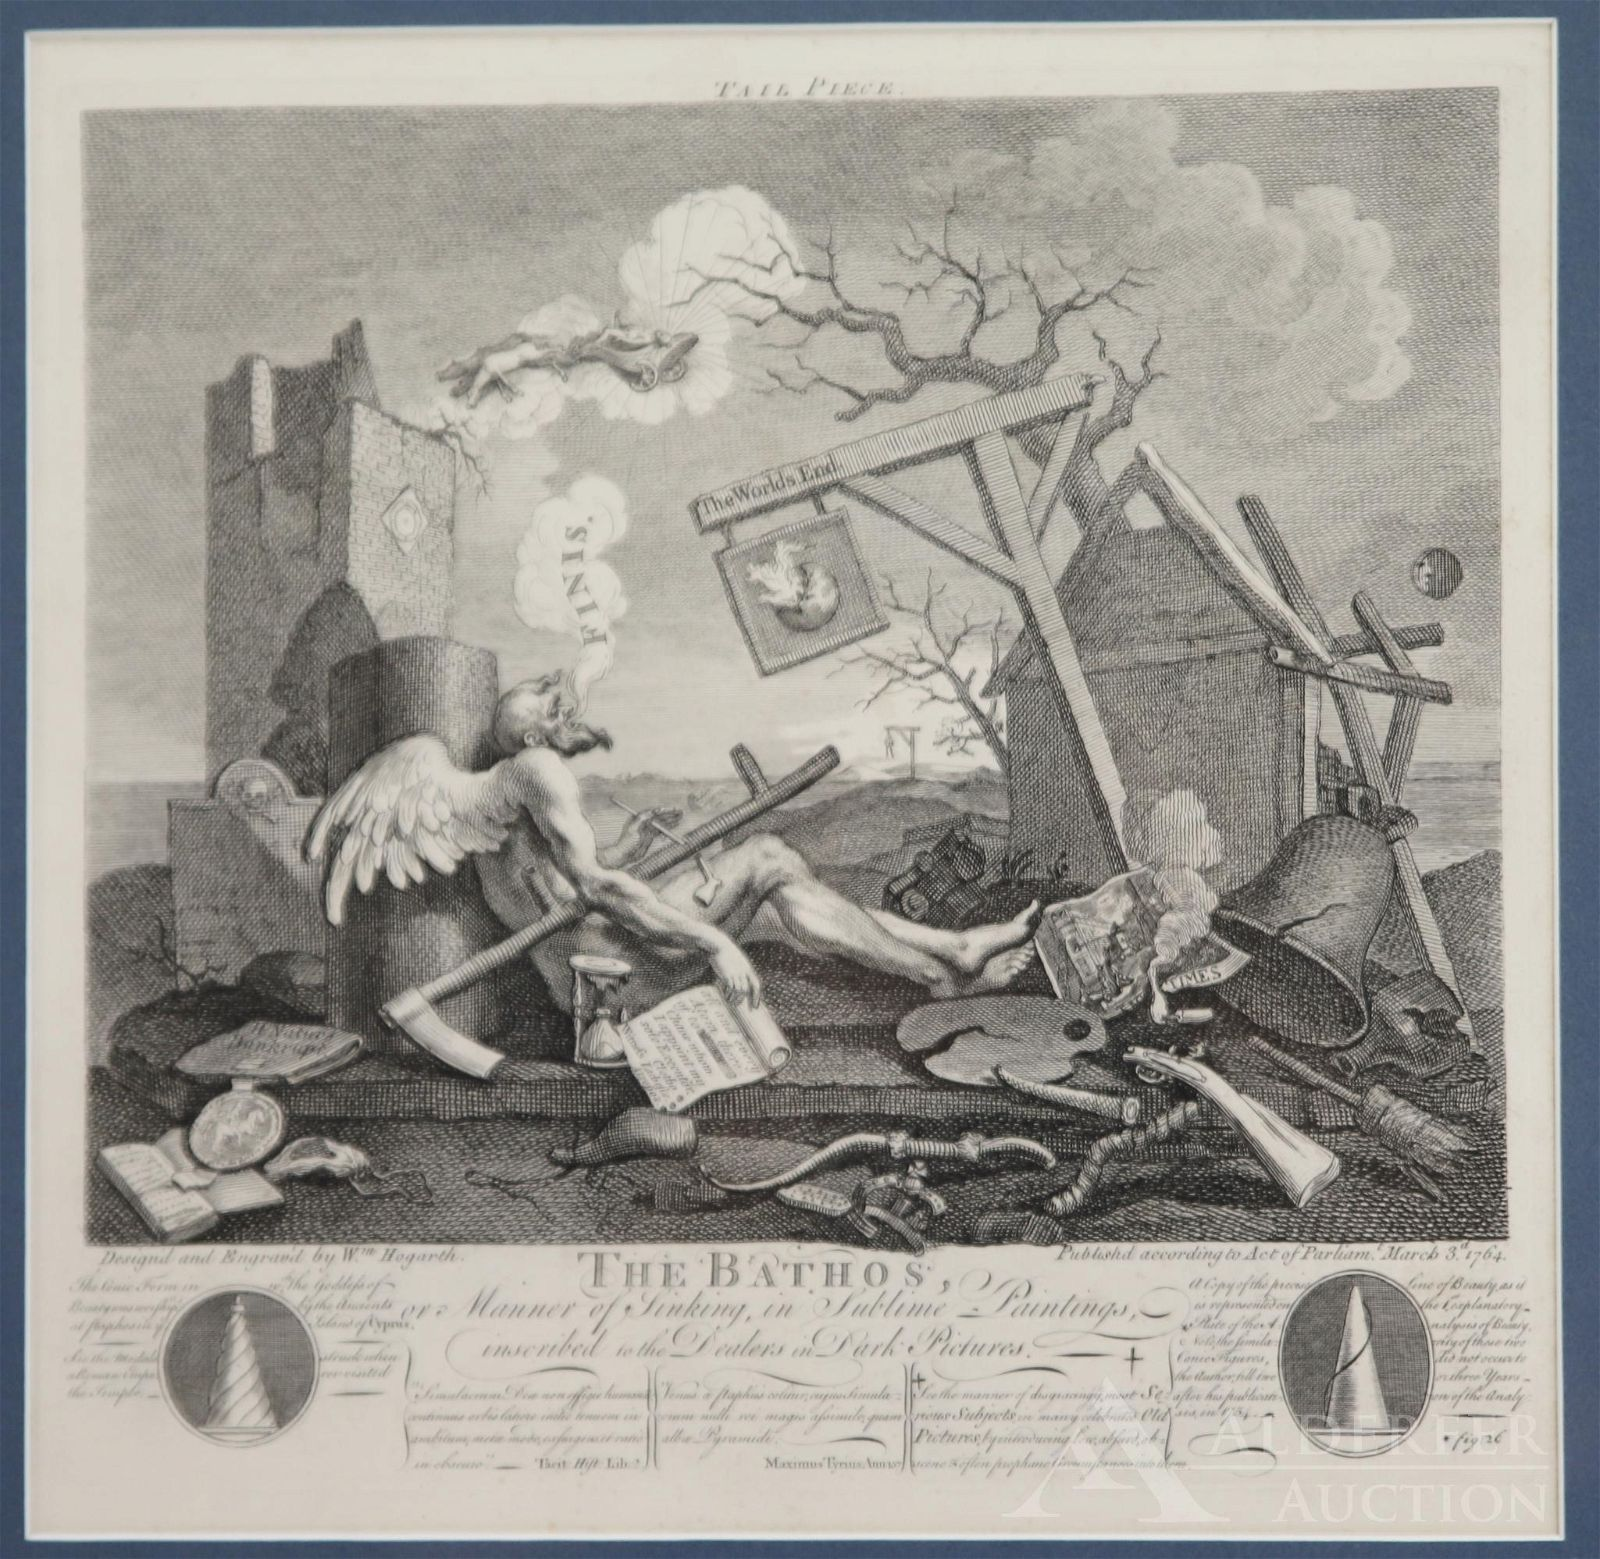 Copperplate Etching by William Hogarth